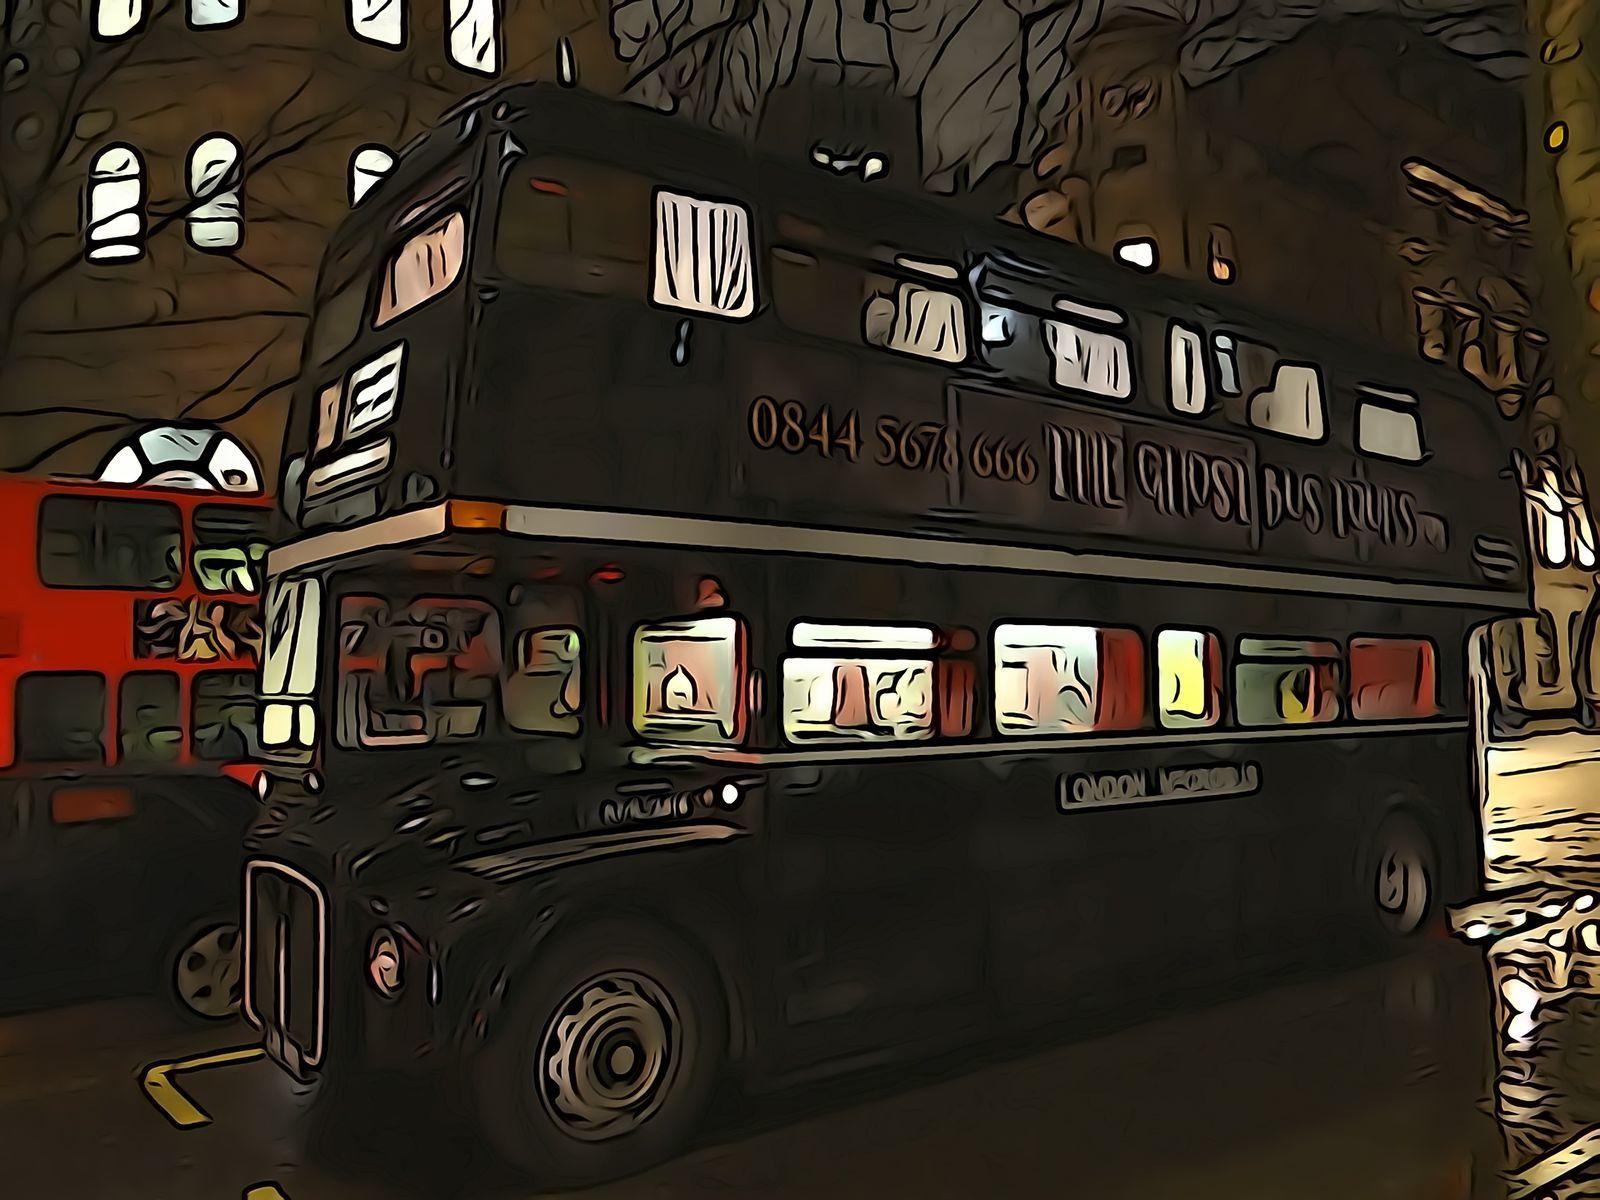 London: Prologue